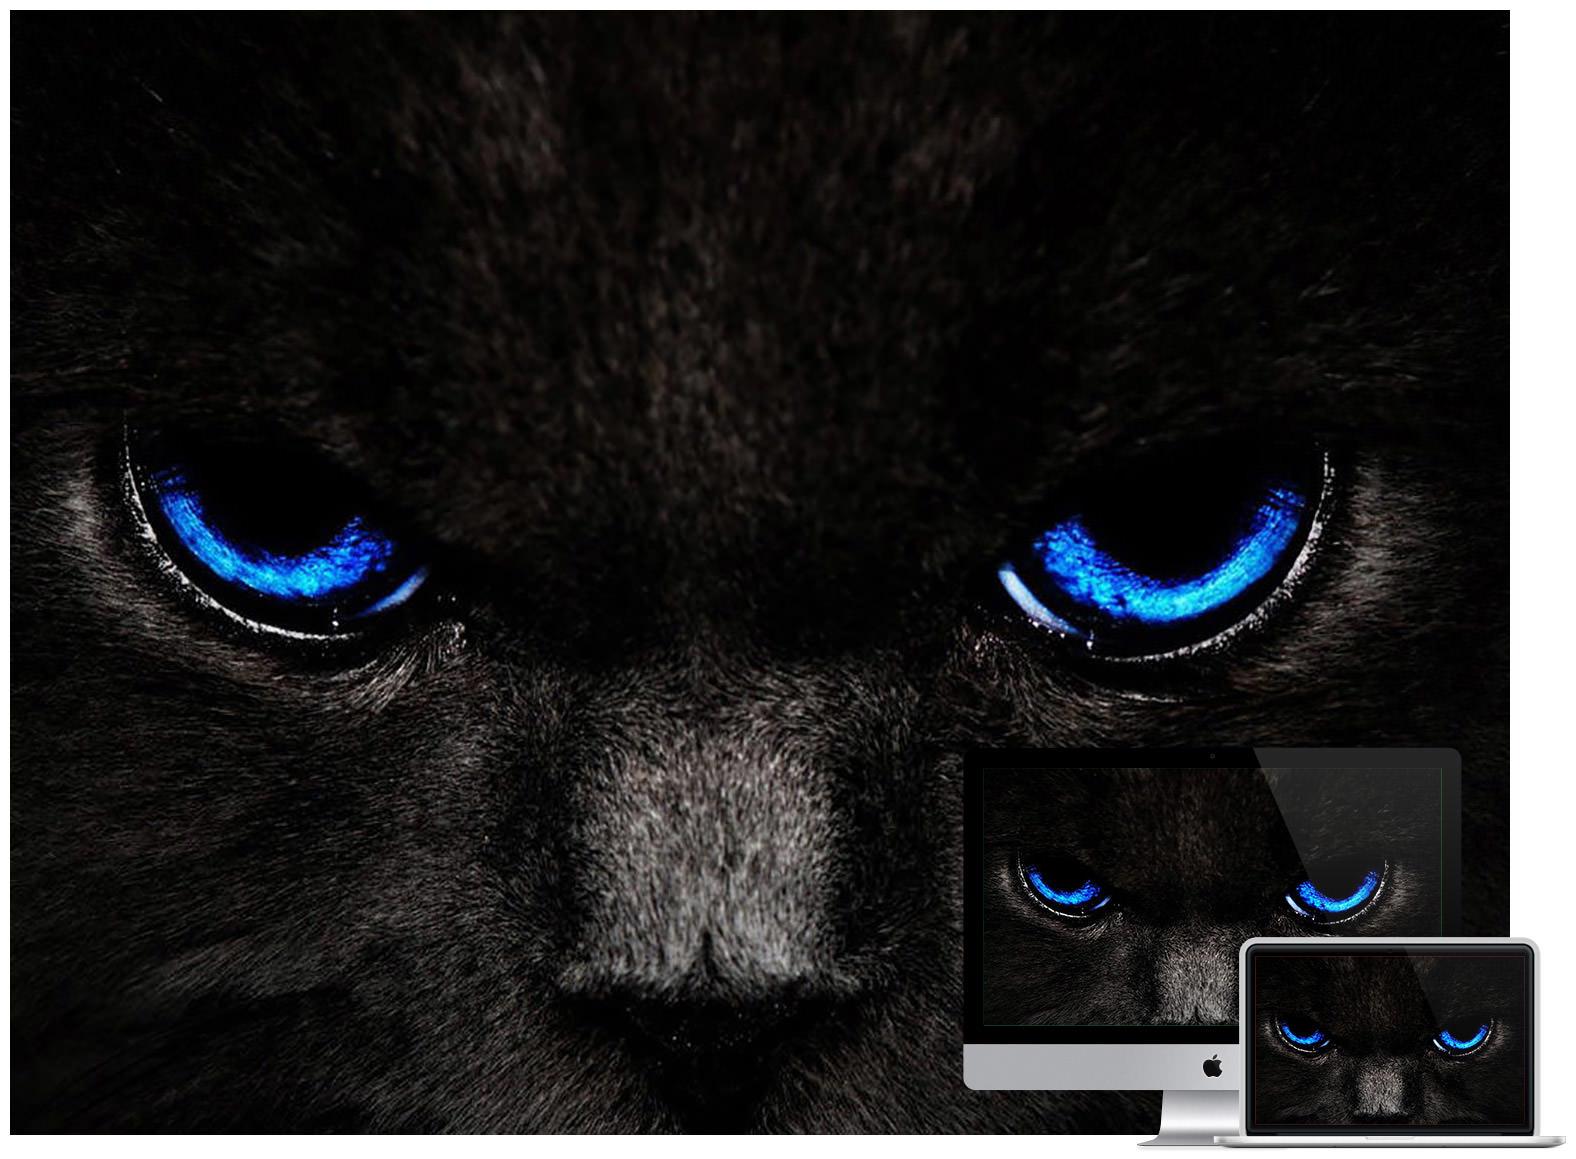 284 2849358 dark cat wallpaper black cat wallpaper 4k